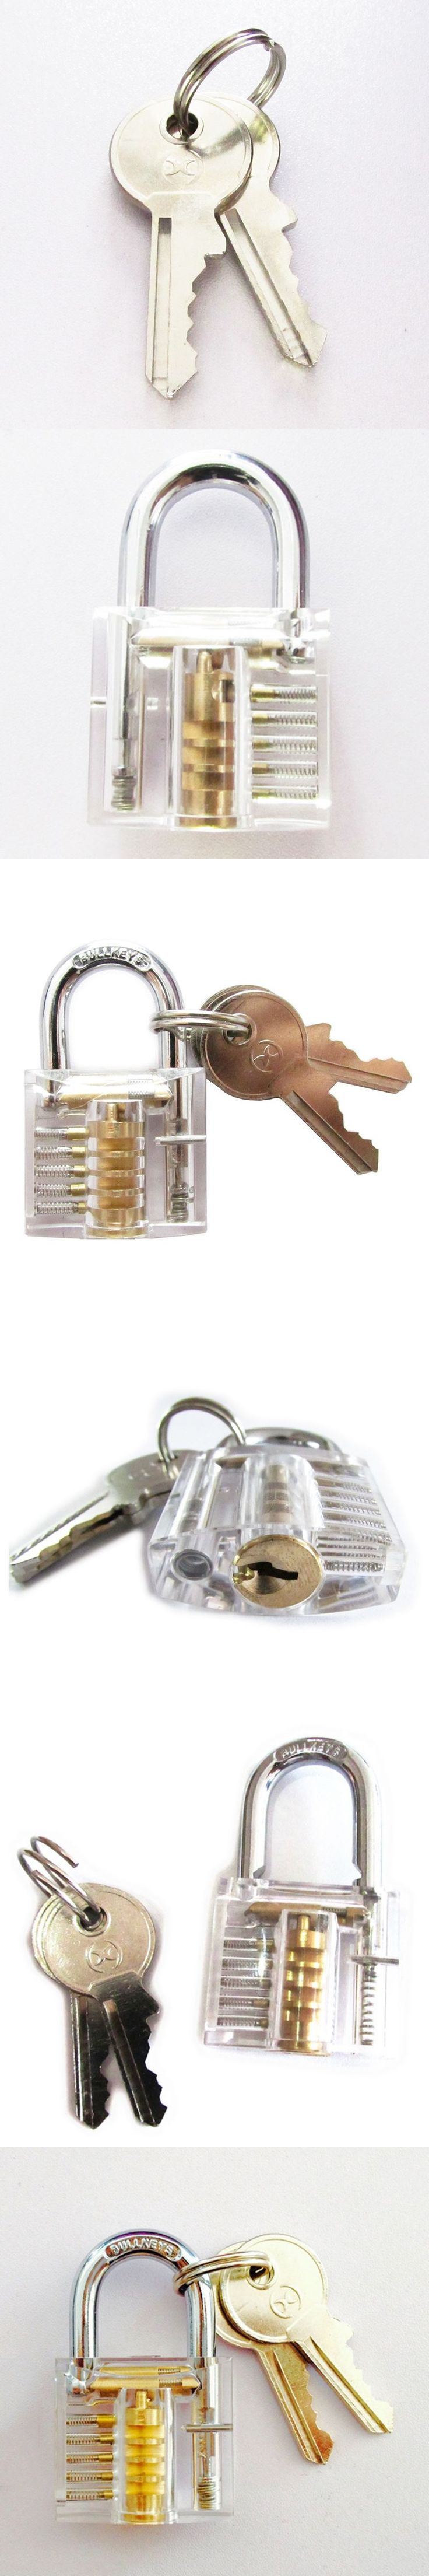 Padlocks Lock Crystal Cutaway Training Skill Pick Lock For Beginners Locksmith Two Keys Locksmith Practice Set